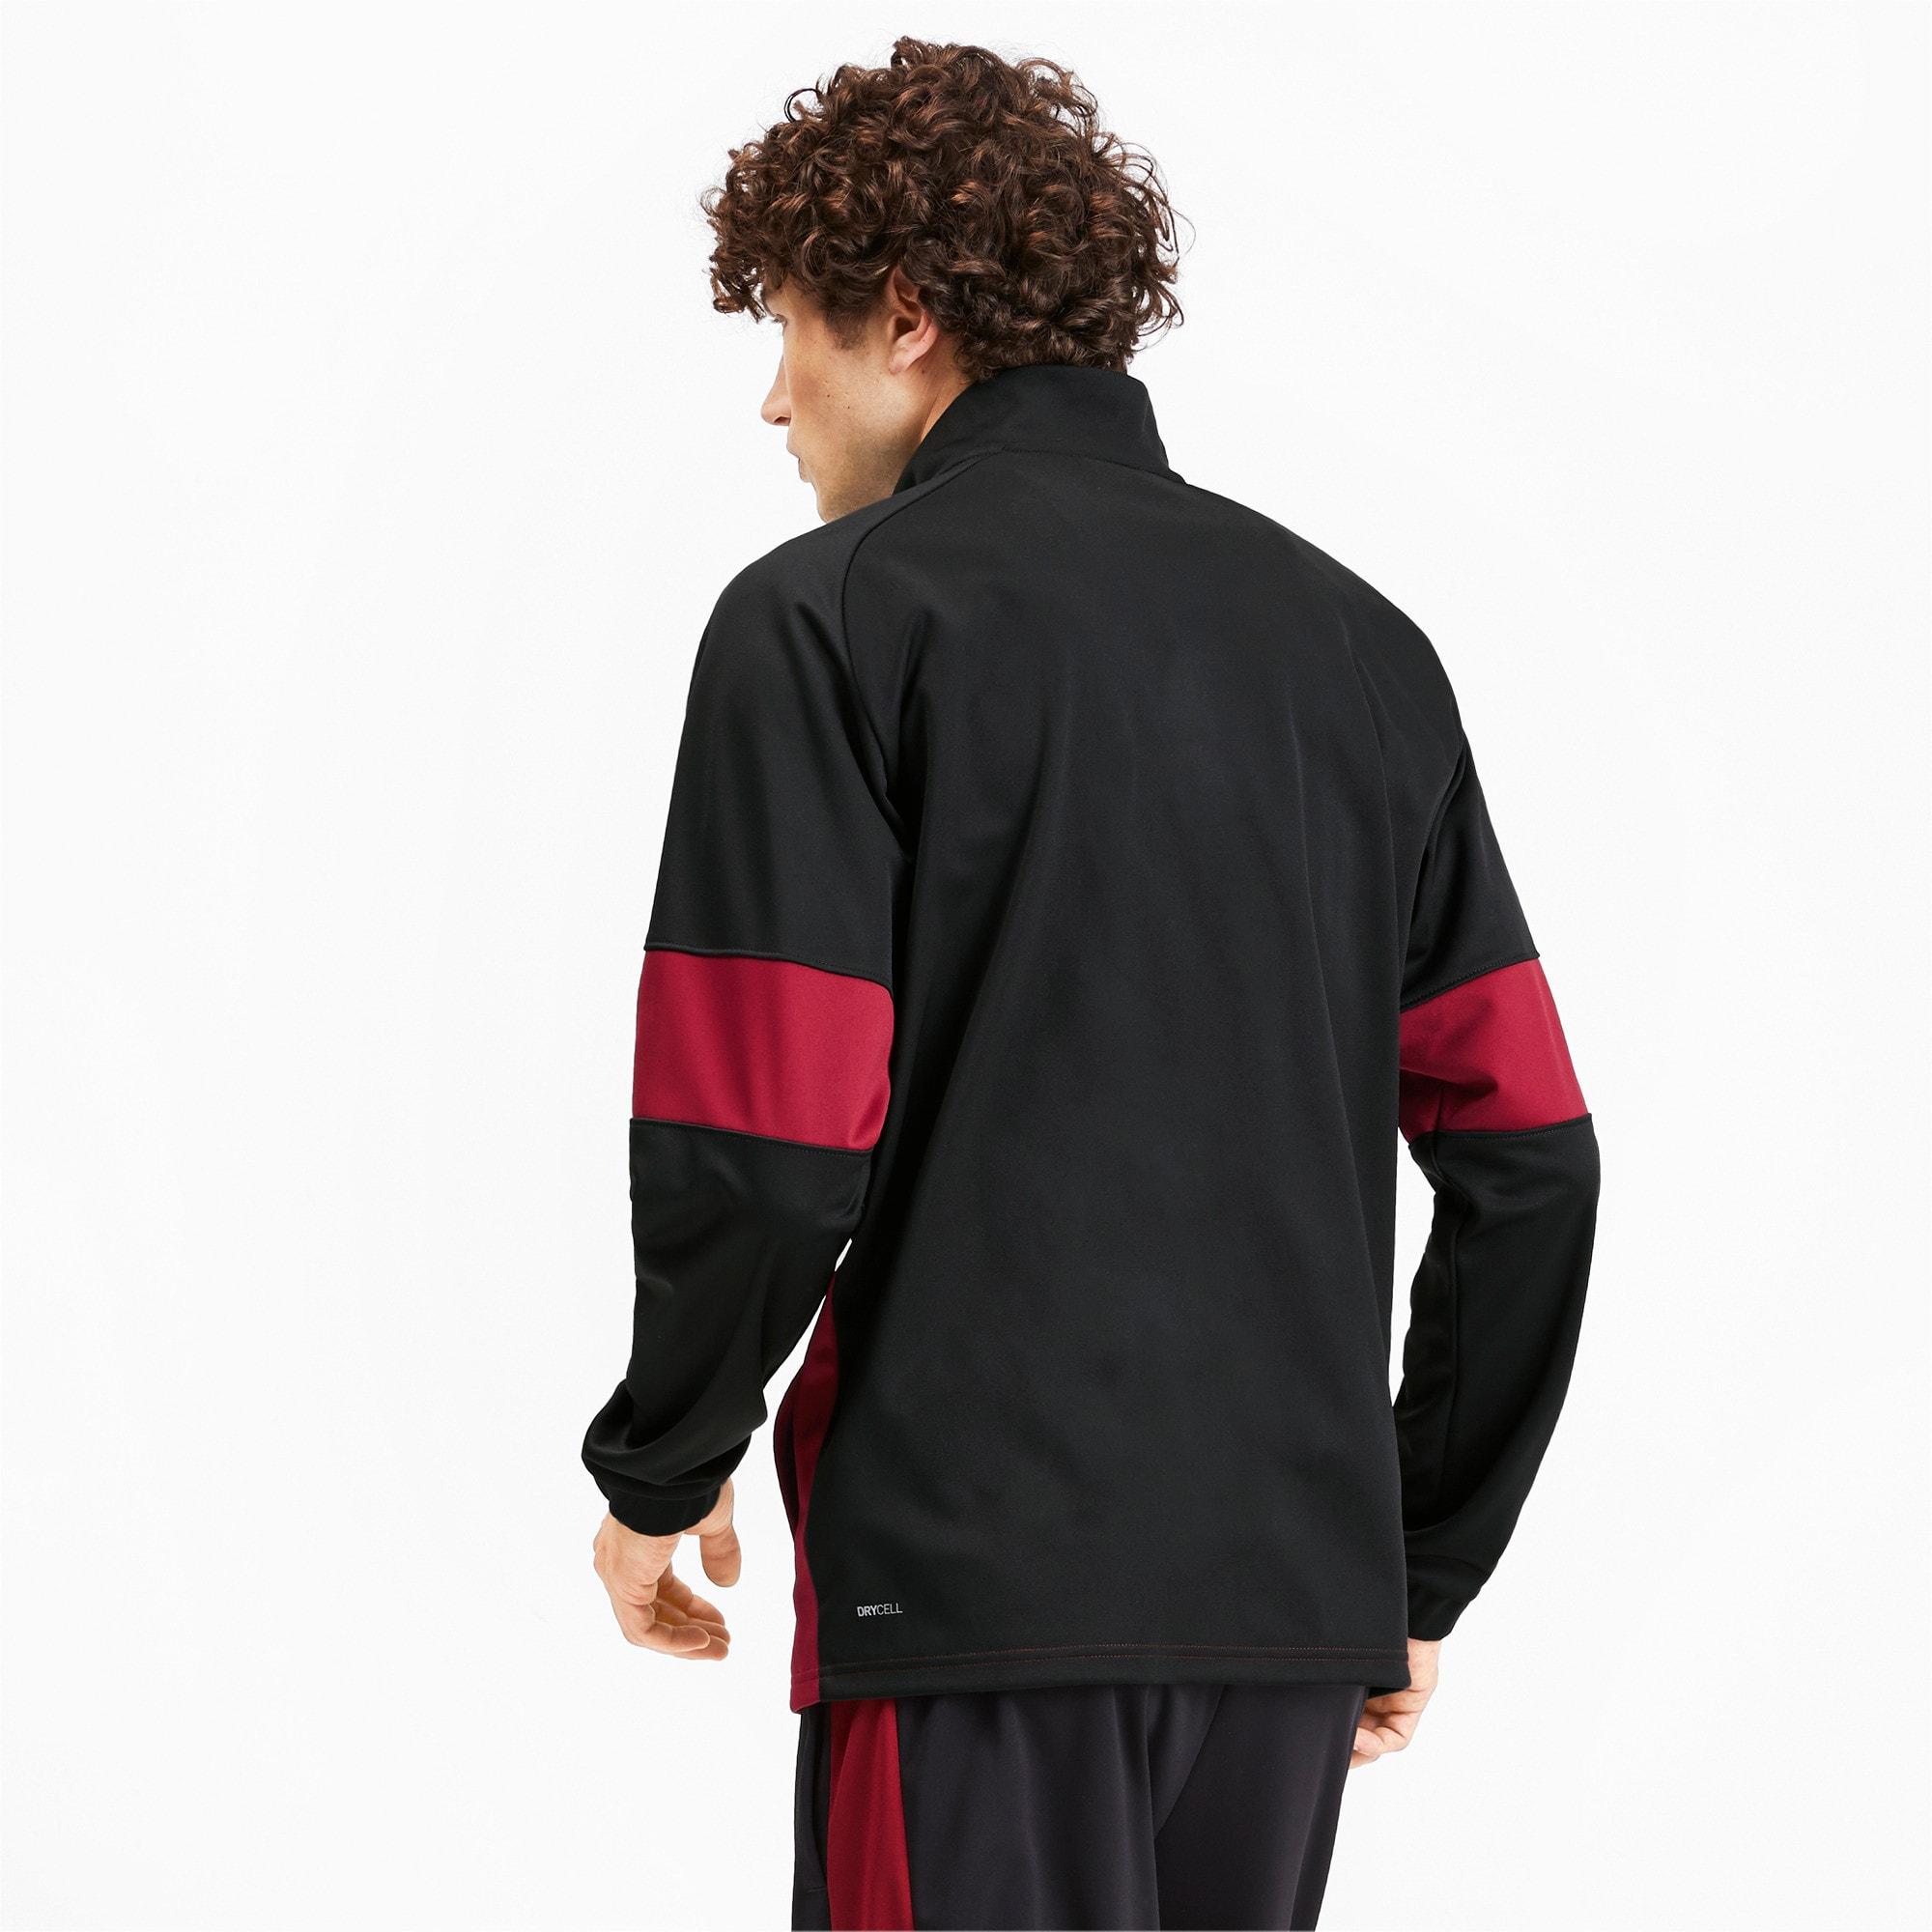 Thumbnail 3 of PUMA Blaster Men's Jacket, Puma Black-Rhubarb, medium